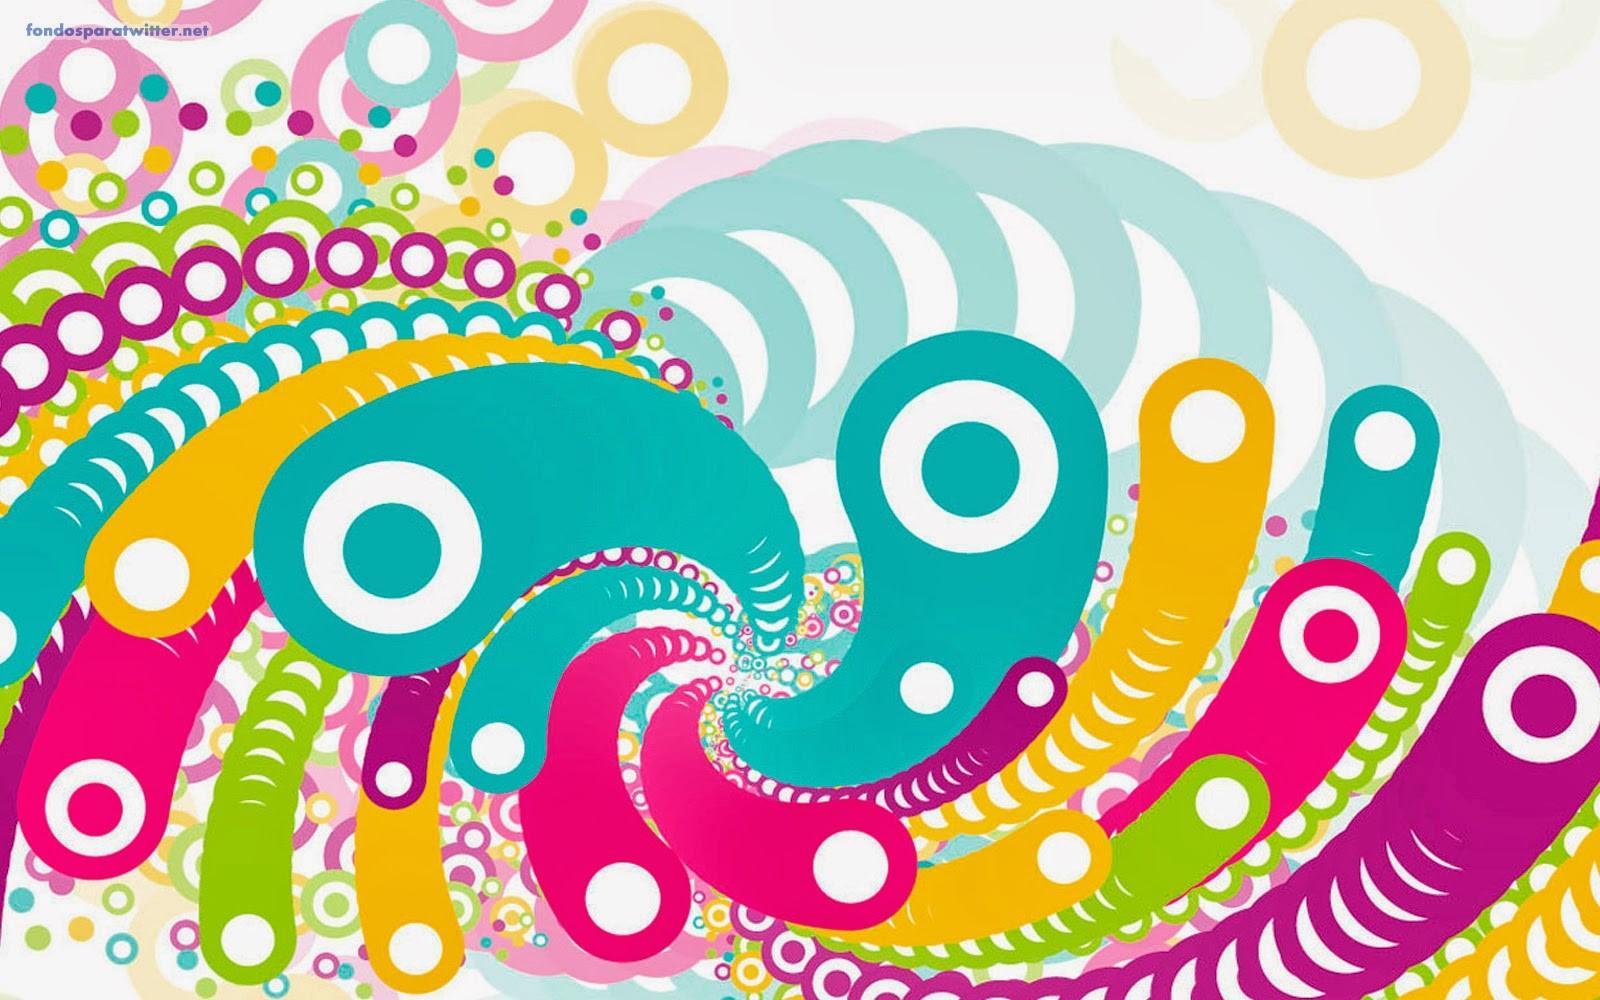 Colorful Bubble Vector Png - HD Wallpaper